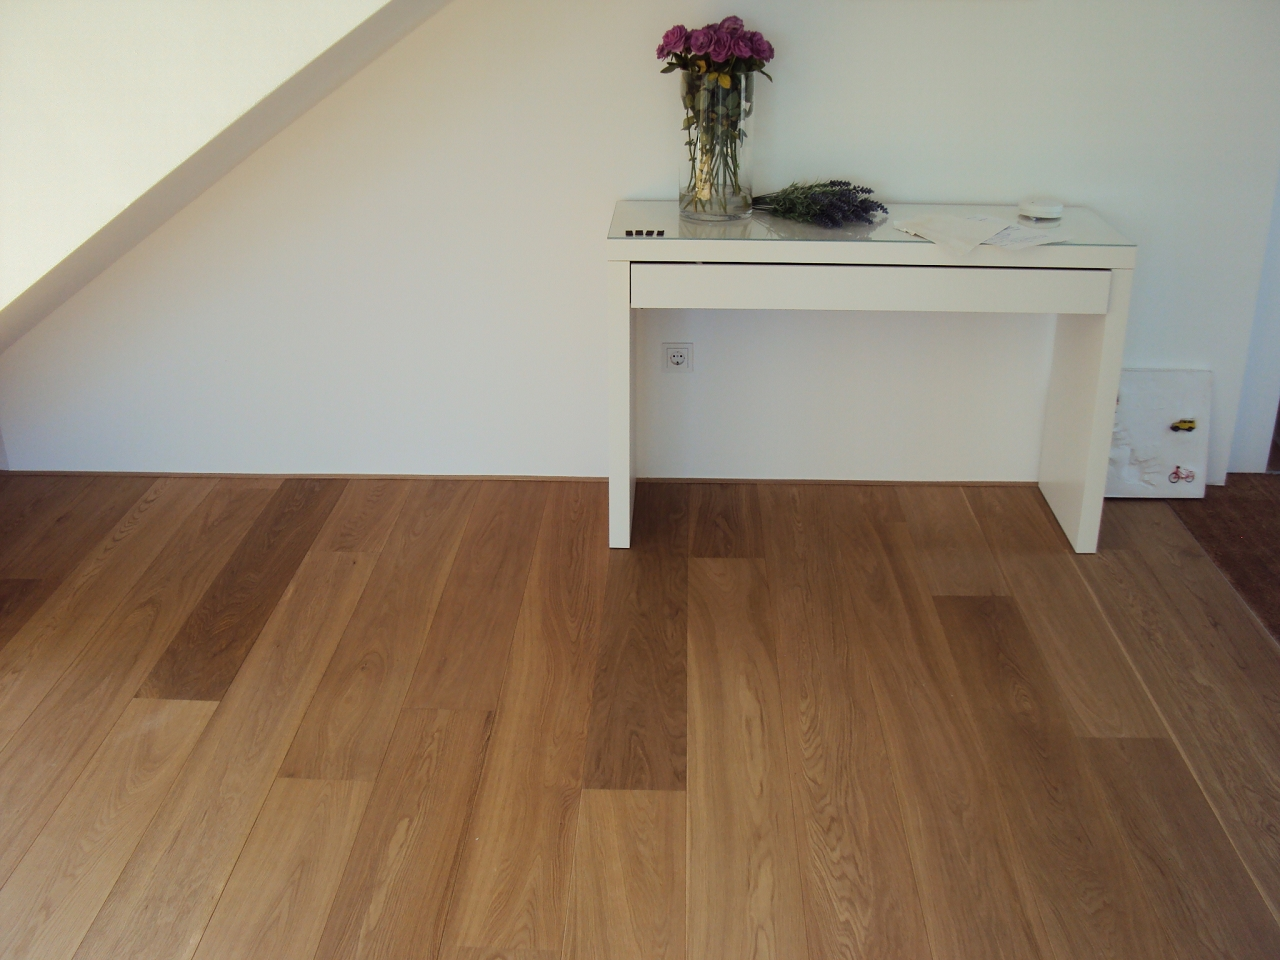 parkett wal parkett und fussbodentechnik. Black Bedroom Furniture Sets. Home Design Ideas